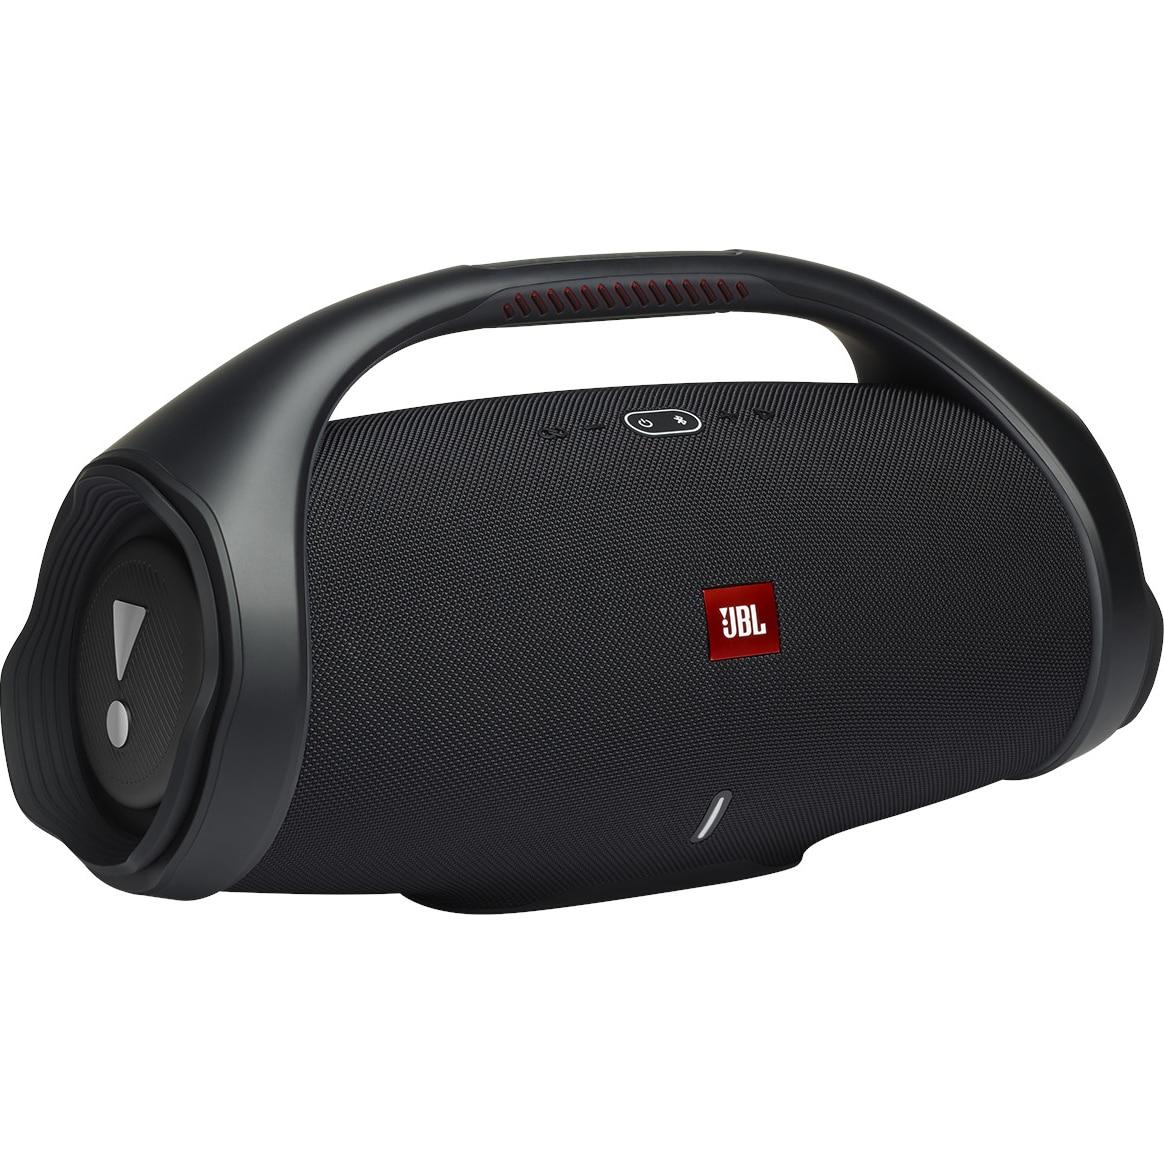 Fotografie Boxa portabila JBL Boombox 2, Bluetooth, Redare 24H, Rezistenta la apa IPX7, Partyboost, Powerbank, Negru